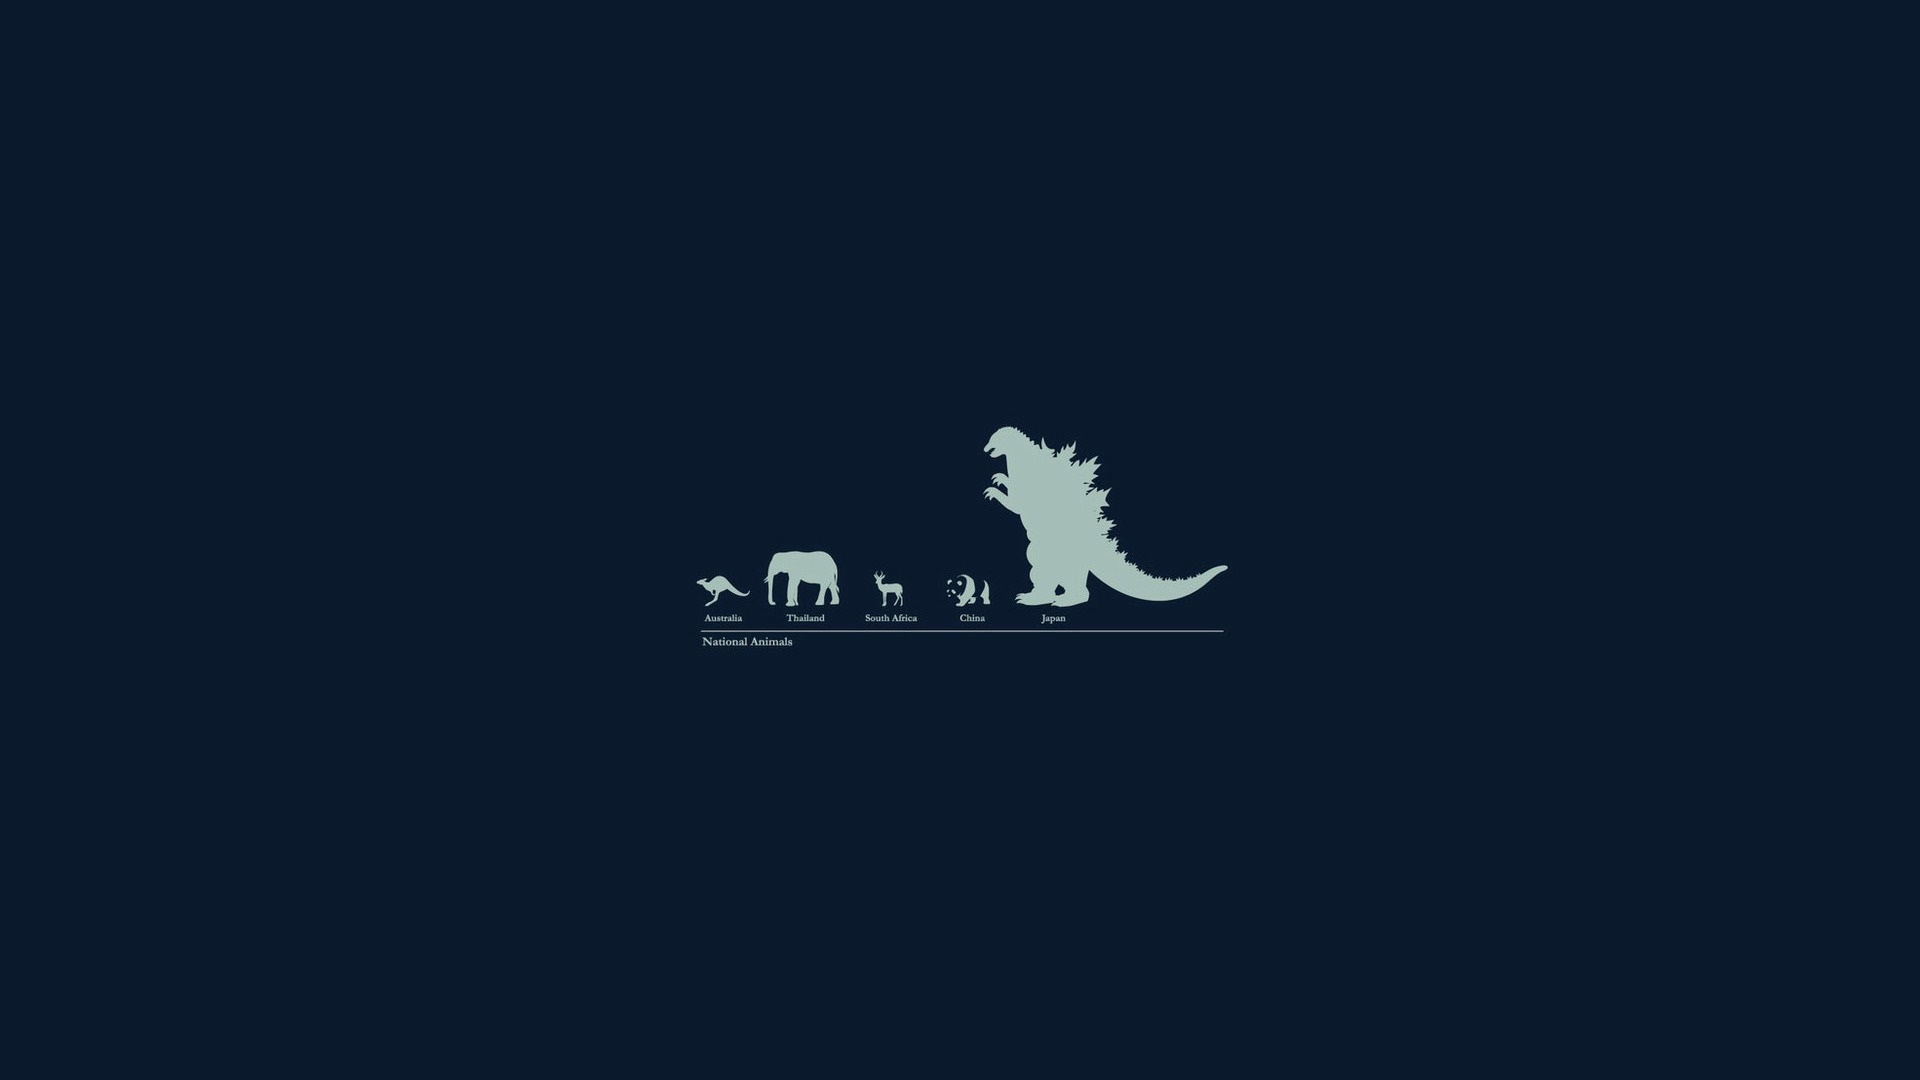 Free Cute Fall Wallpapers Godzilla Wallpapers Hd Pixelstalk Net